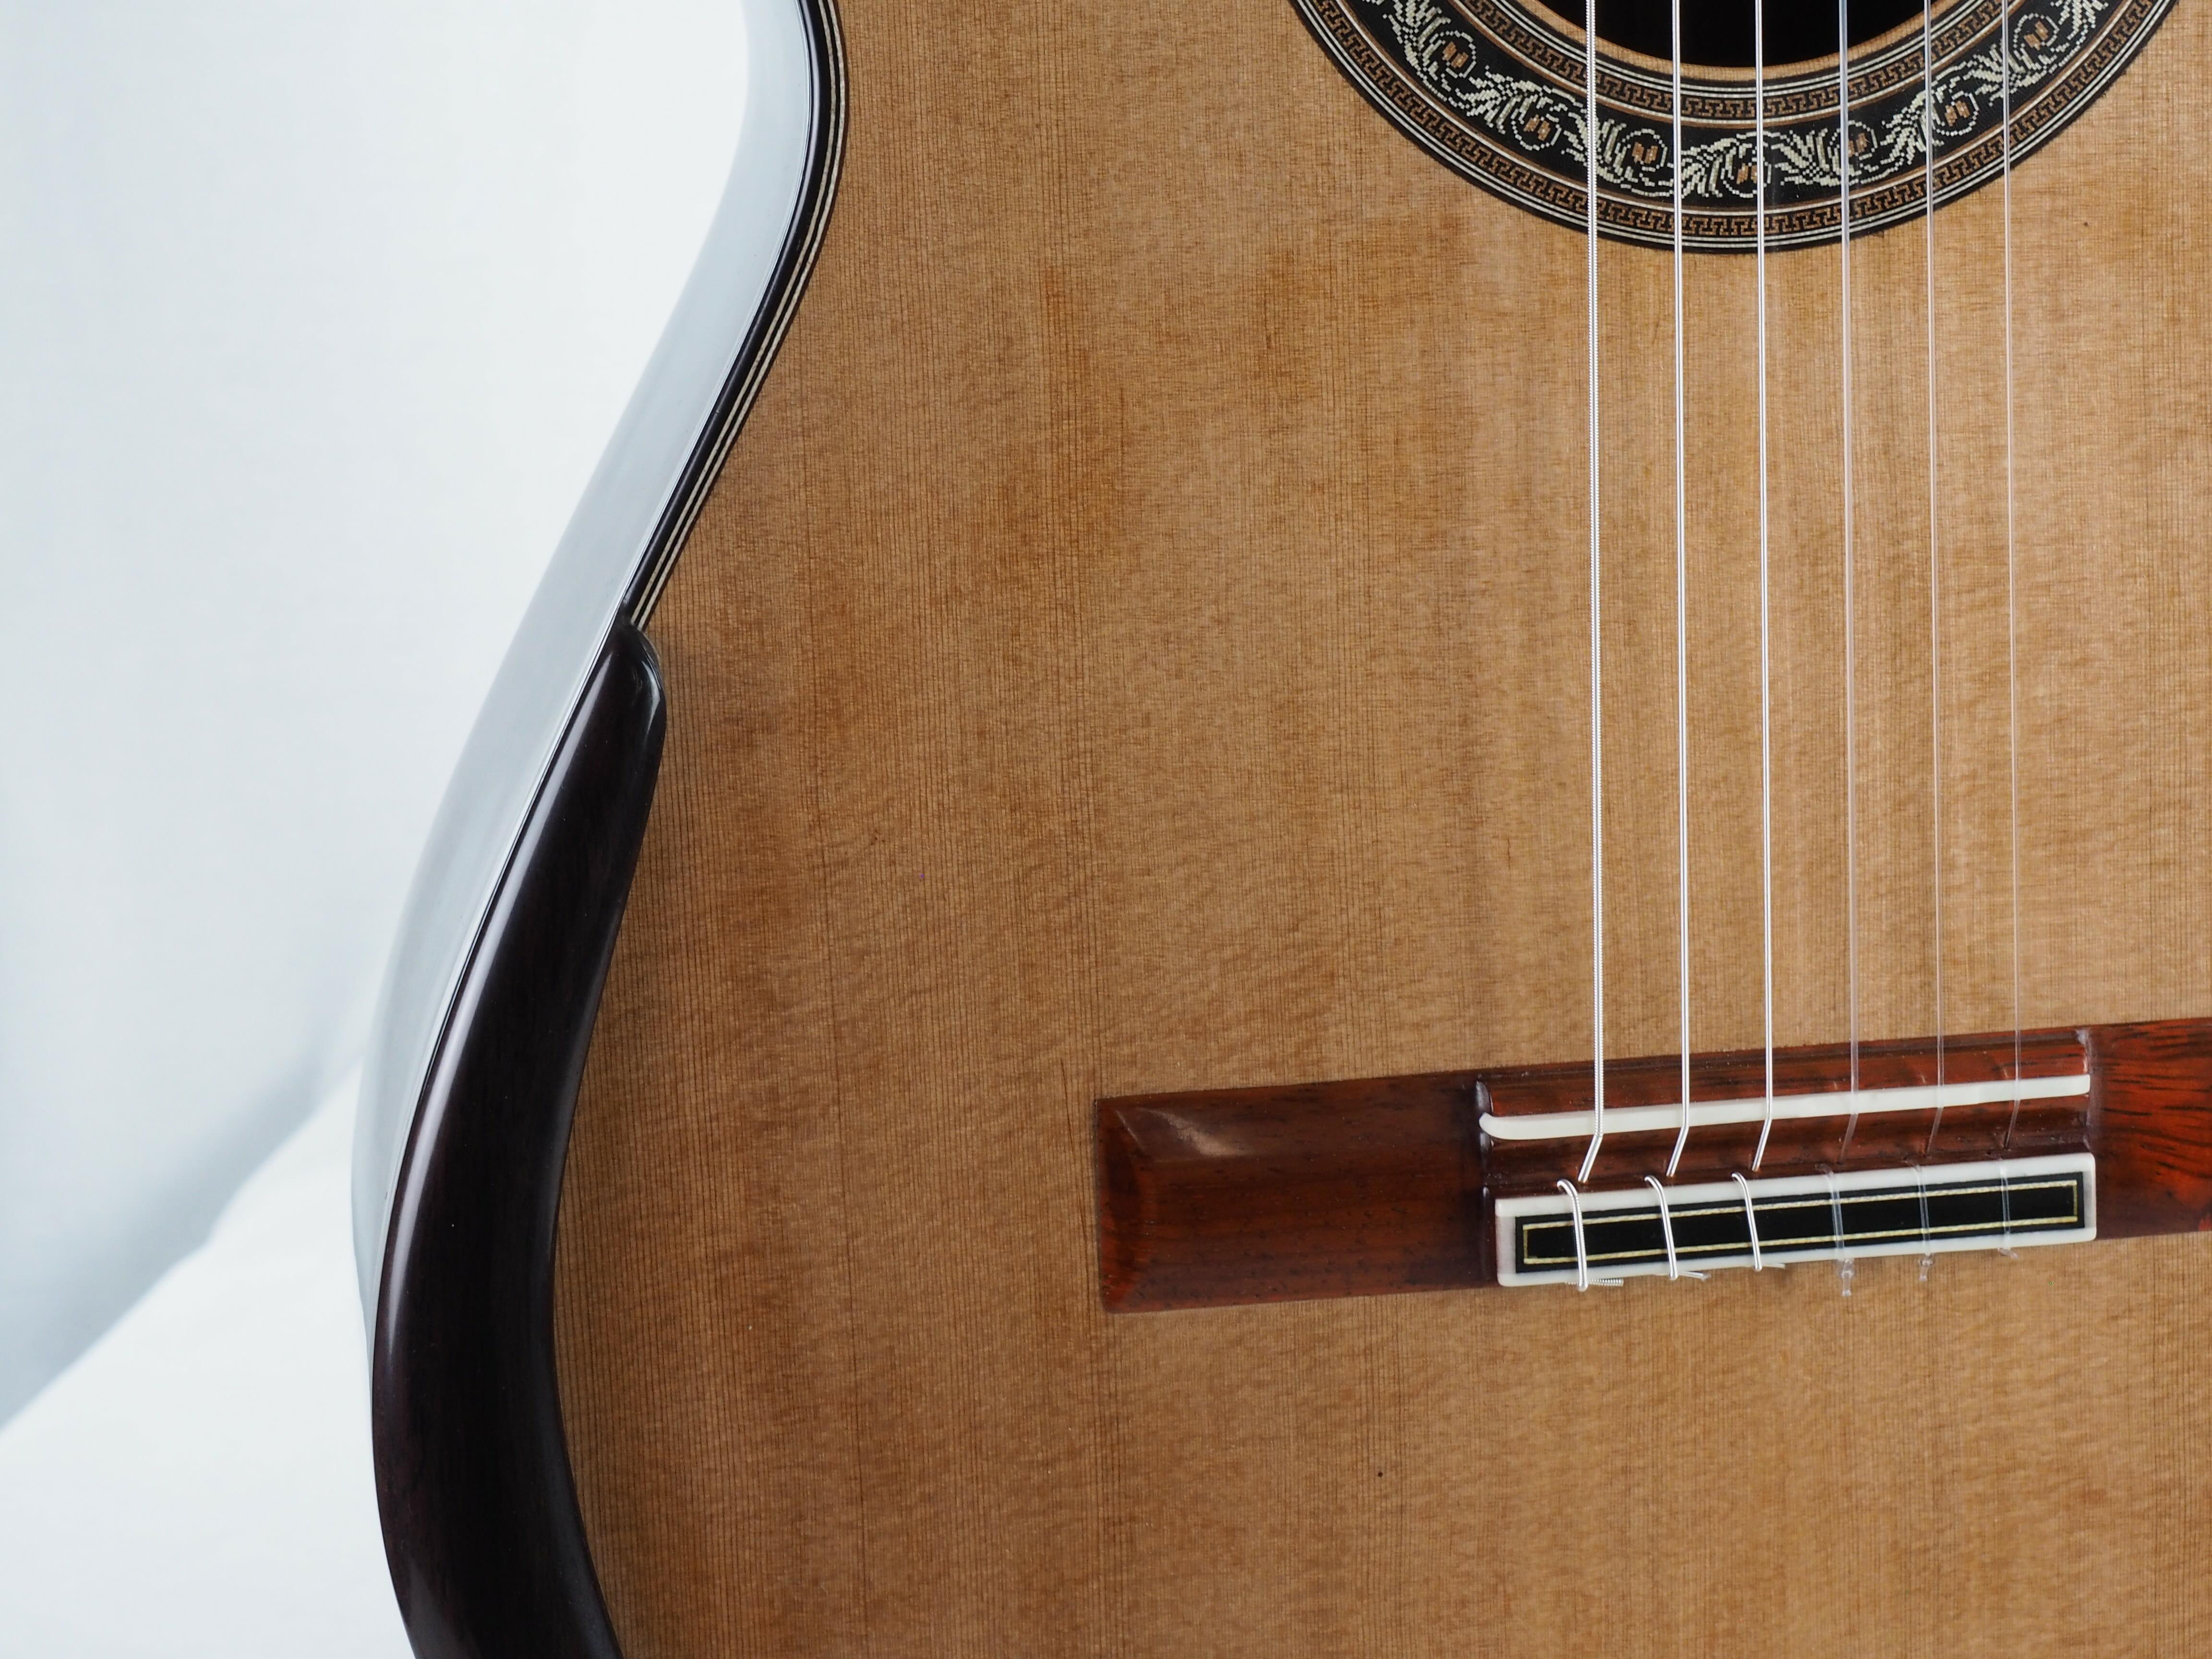 Koumridis Charalambos guitare classique n°87